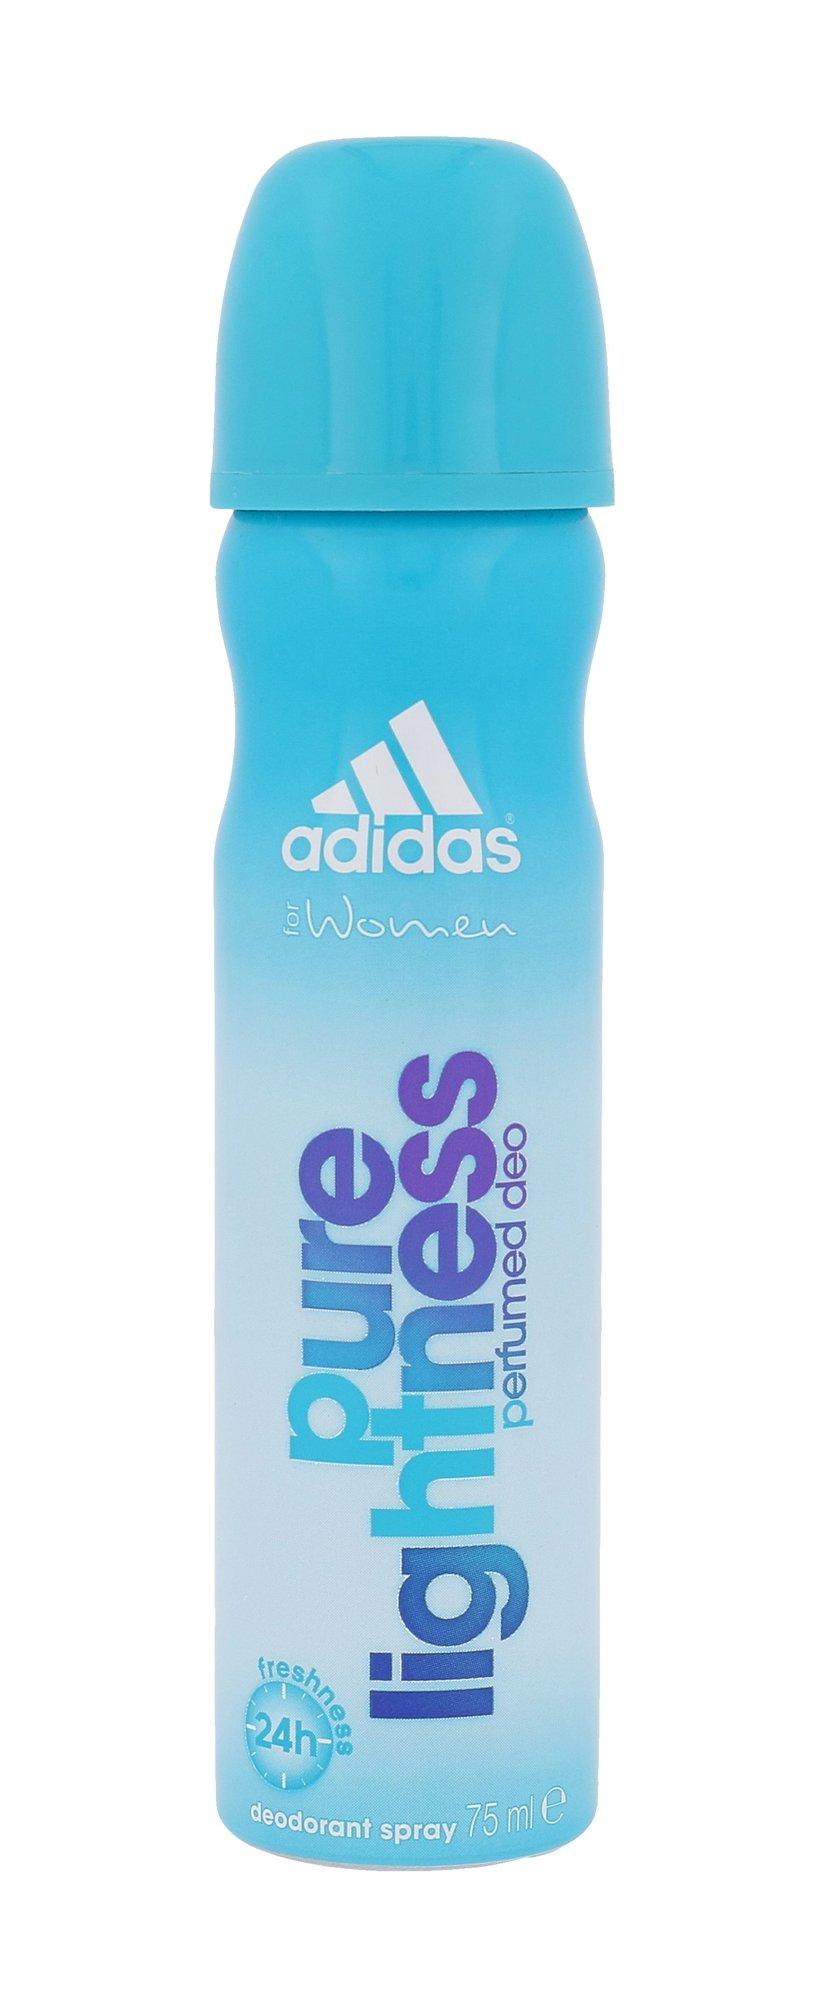 Adidas Pure Lightness For Women Deodorant 75ml